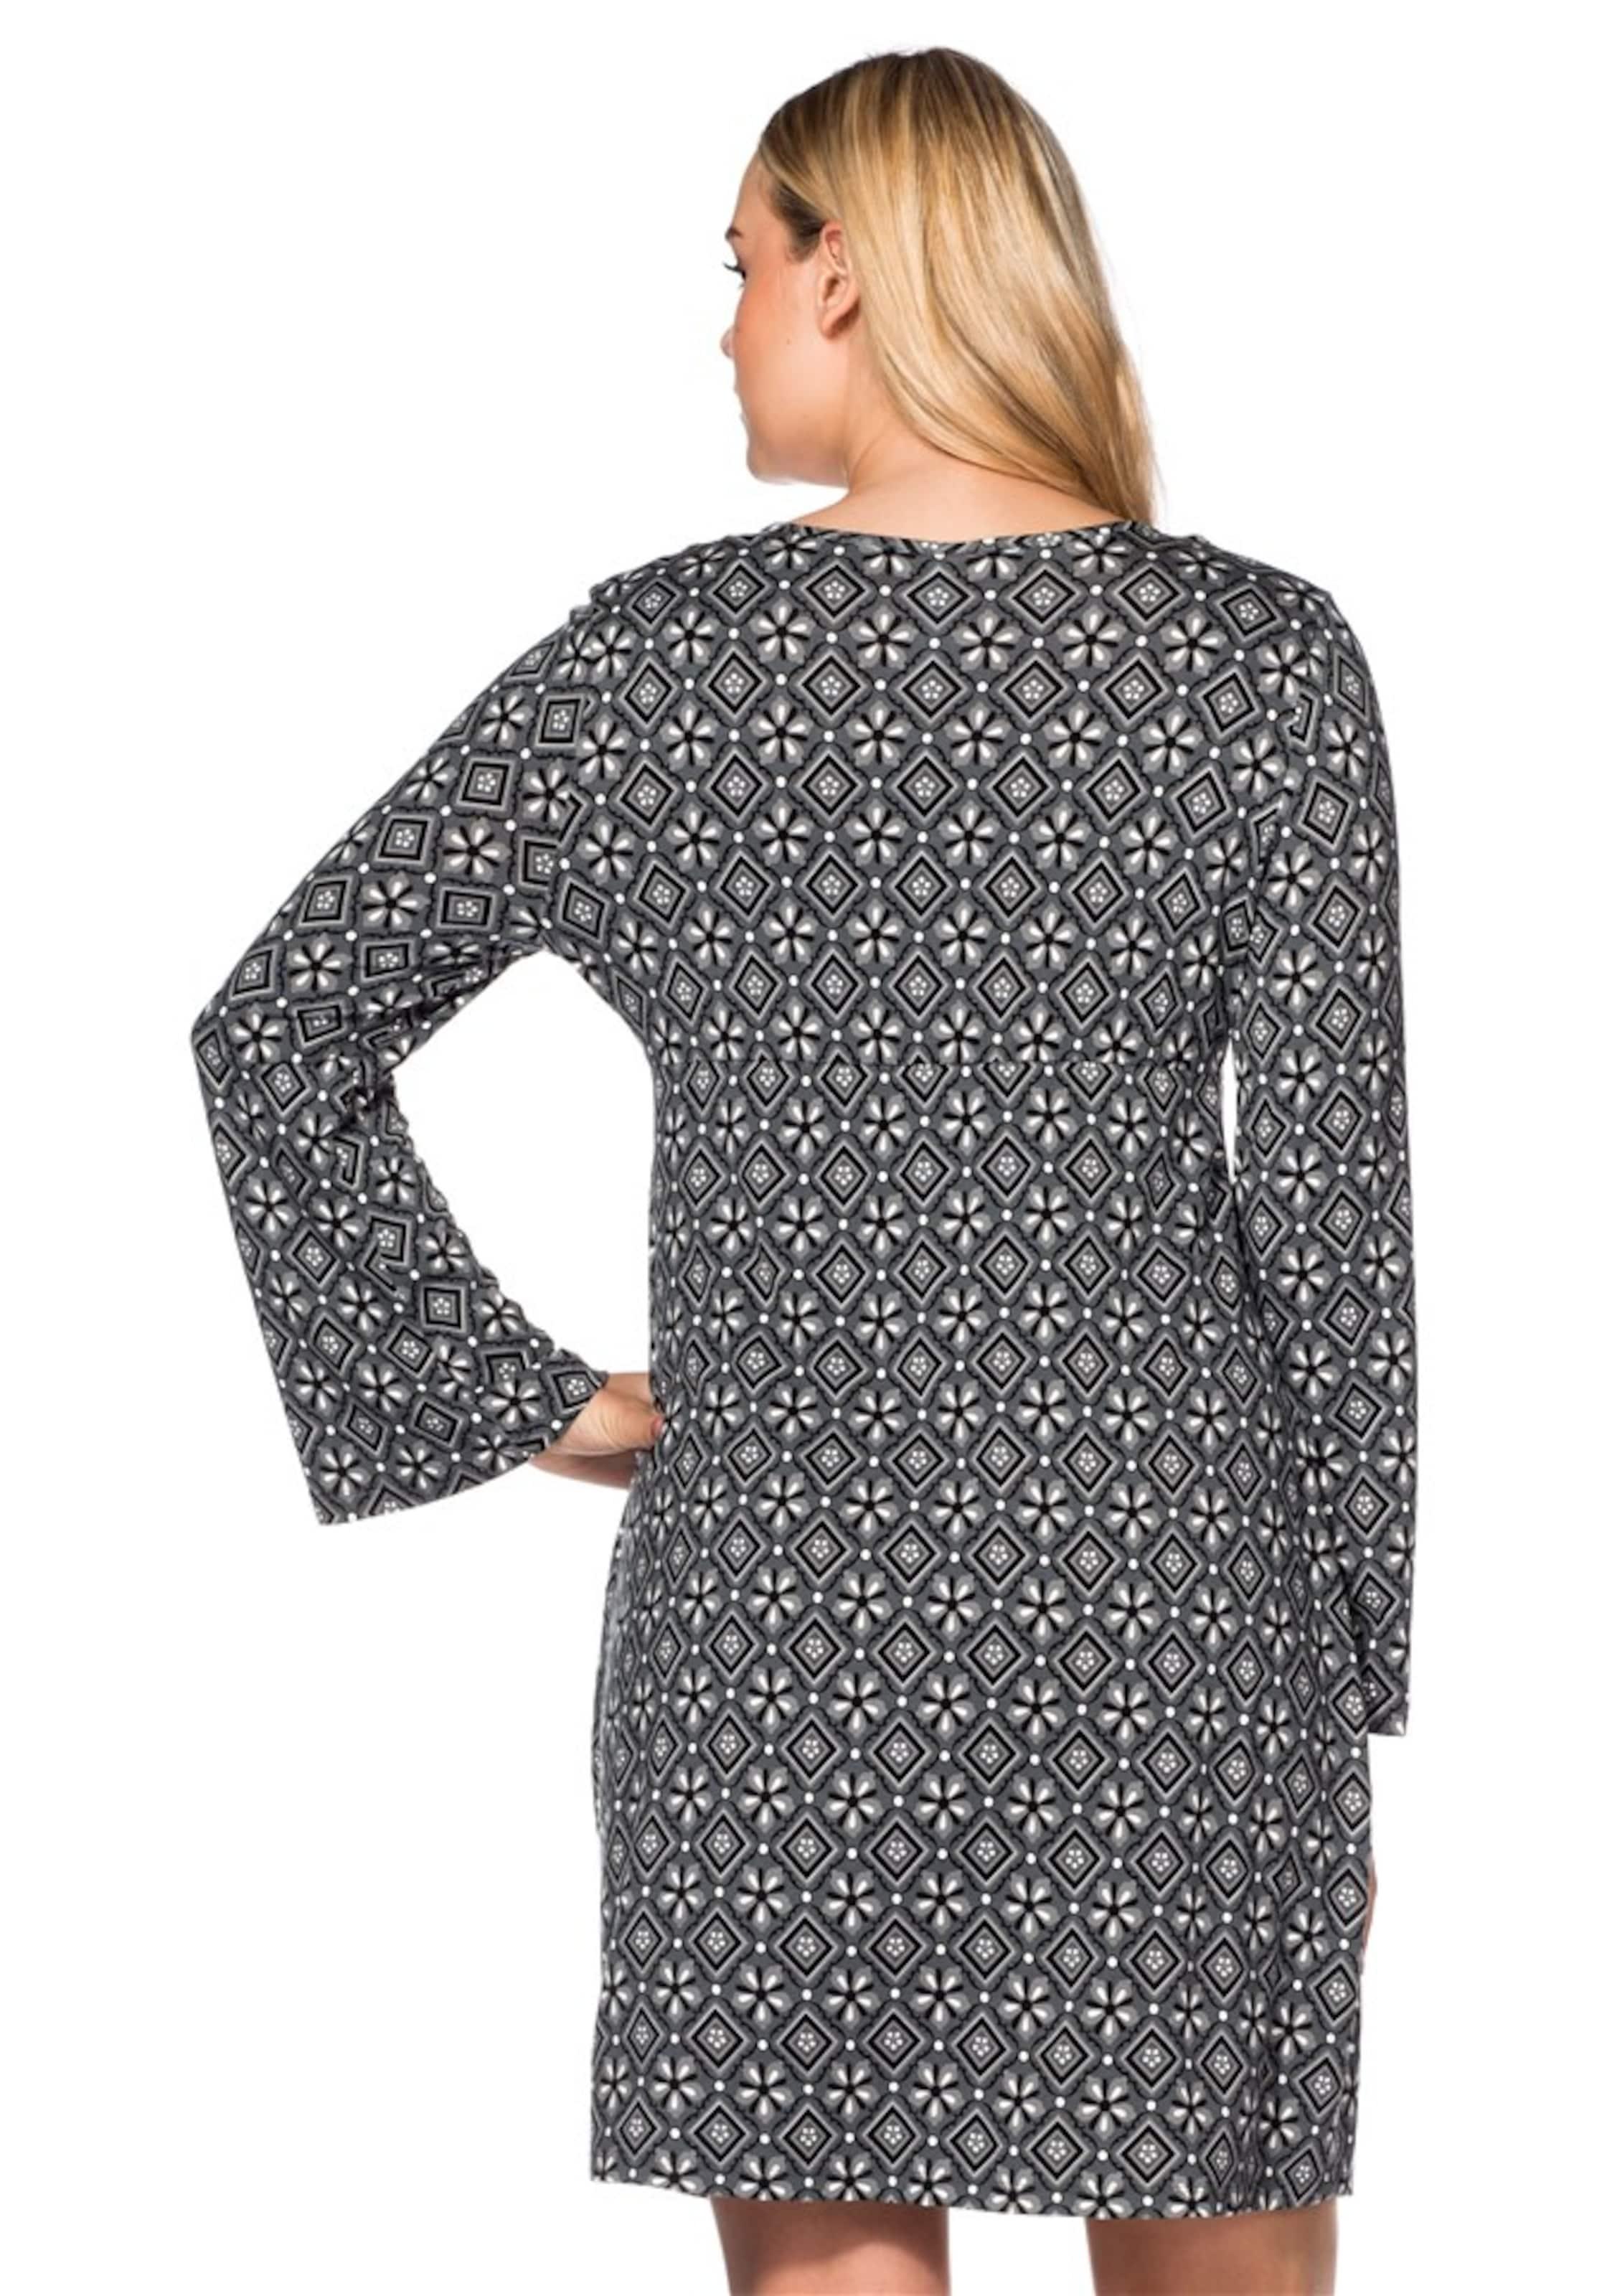 Style Style Jerseykleid In GrauWeiß Jerseykleid GrauWeiß Sheego Style Jerseykleid In Sheego Sheego H9YE2WDI